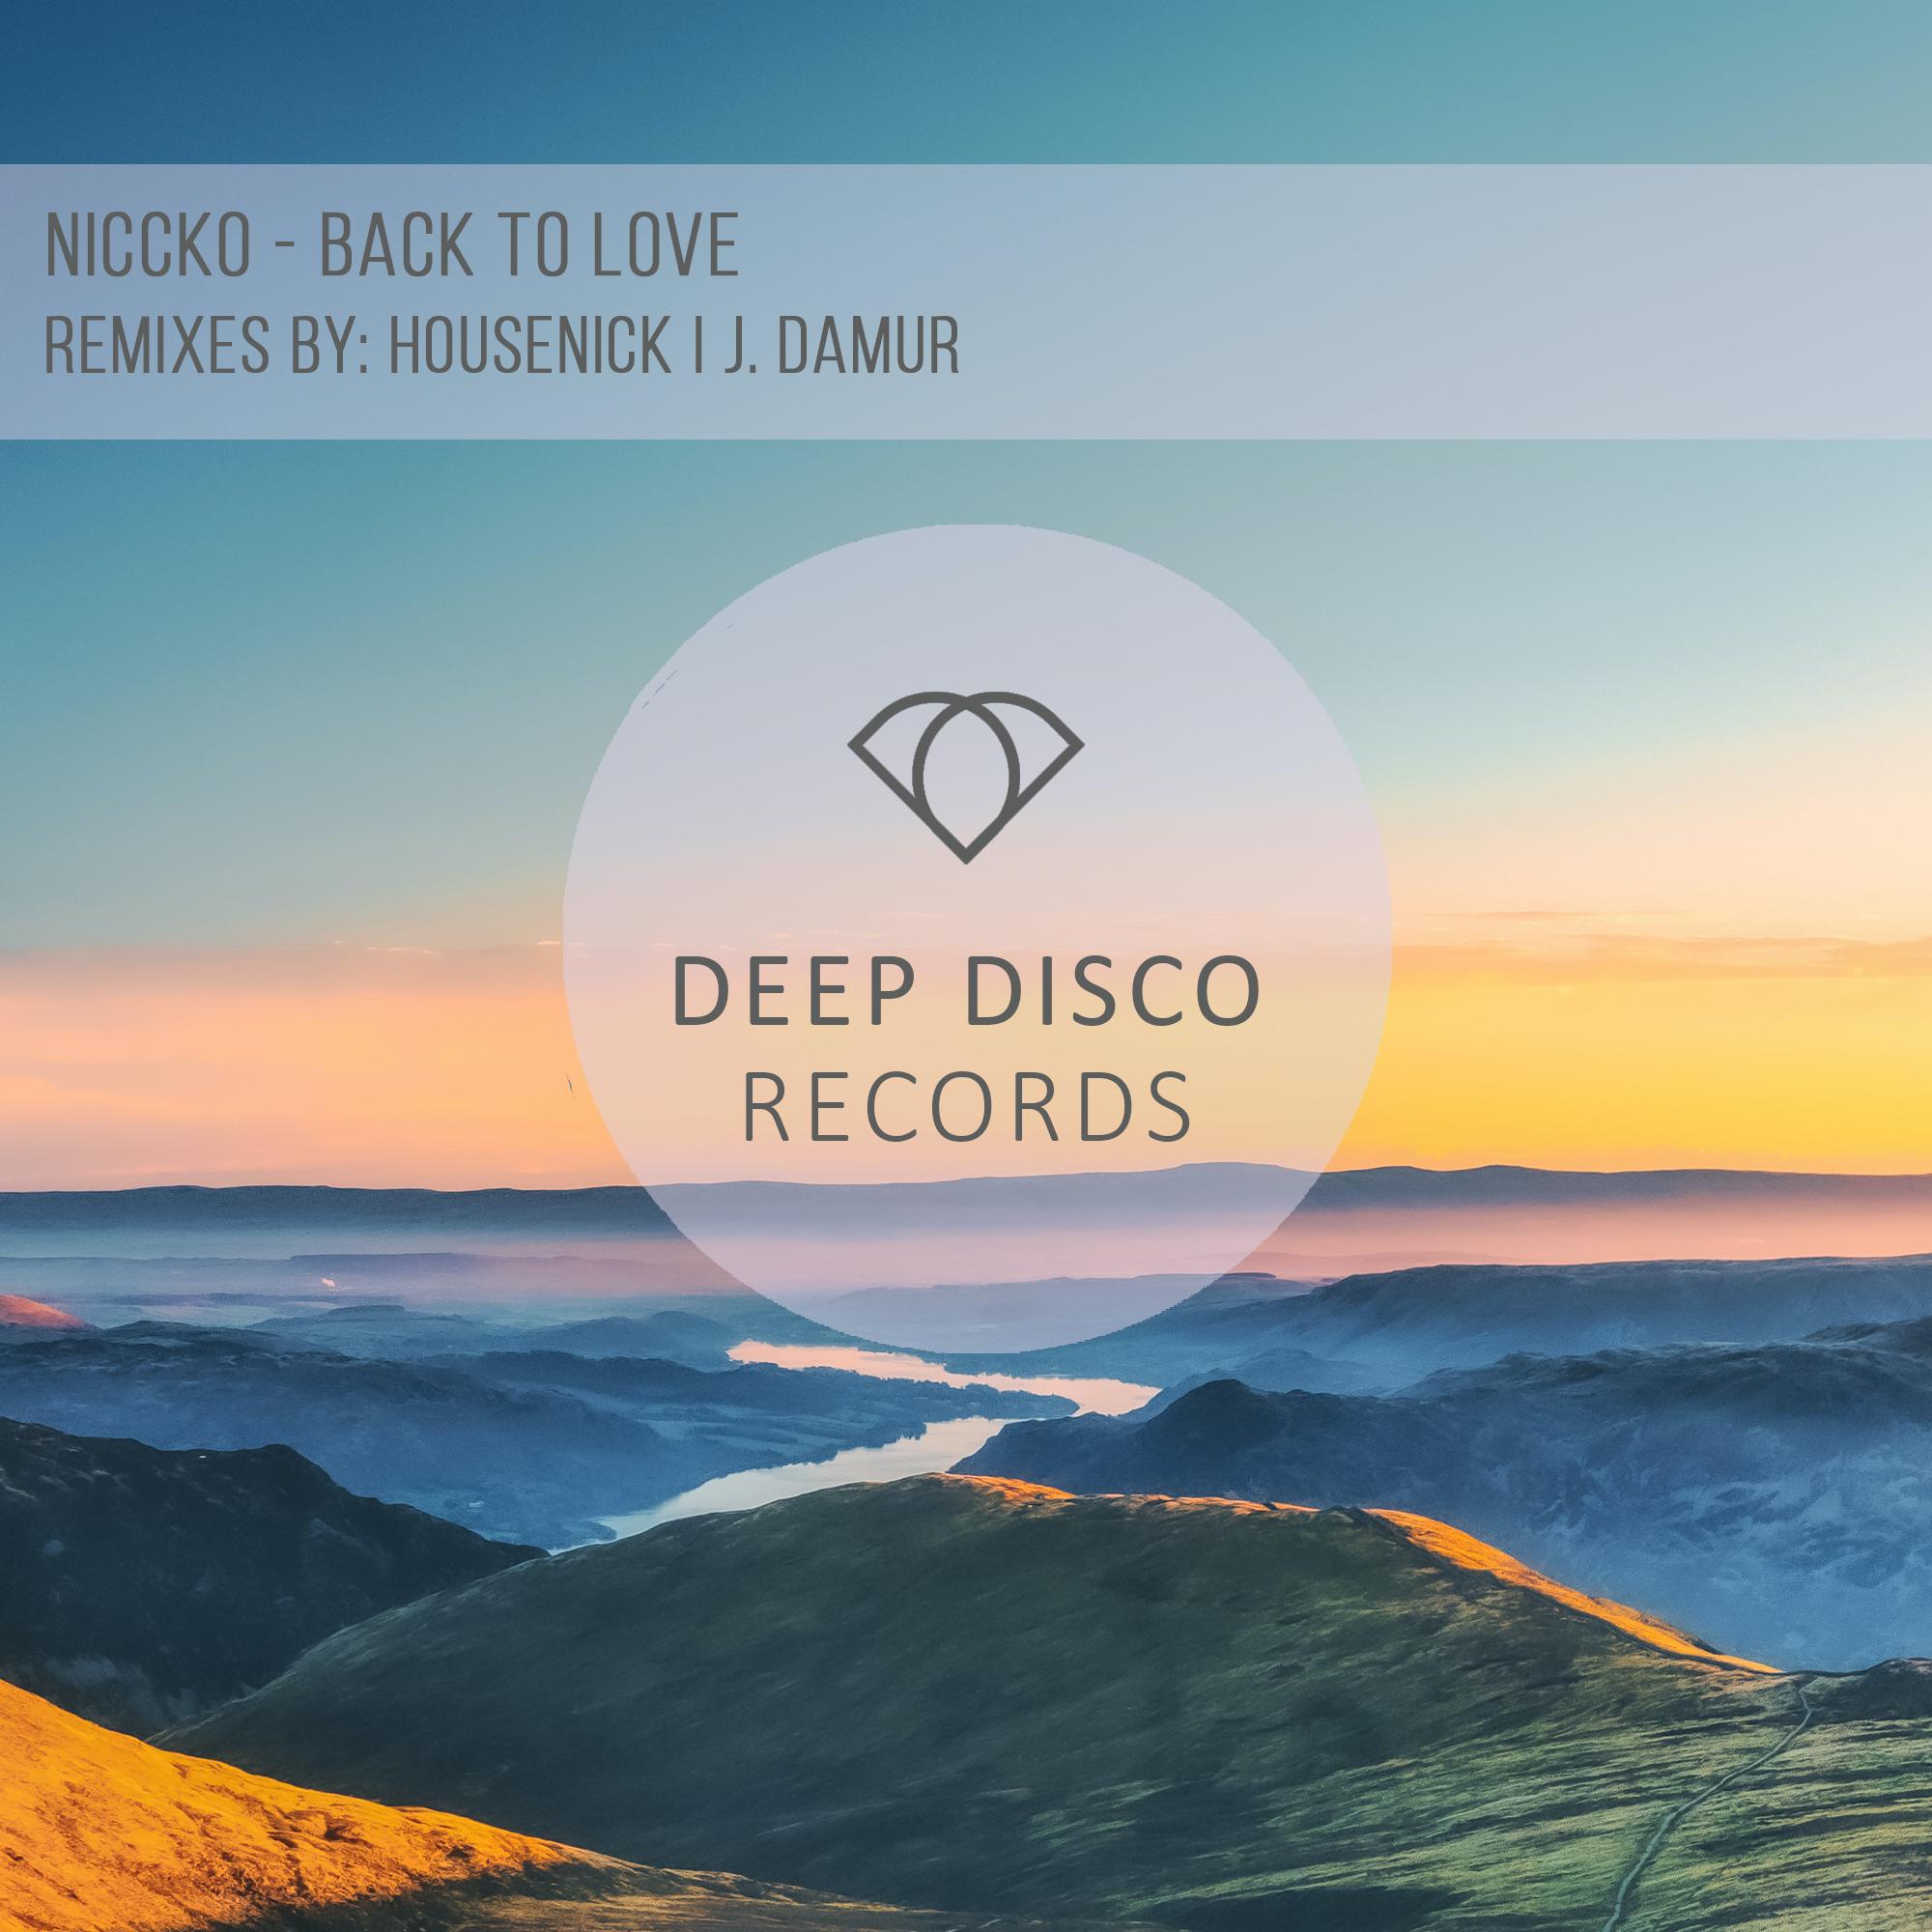 NICCKO - Back to Love Image